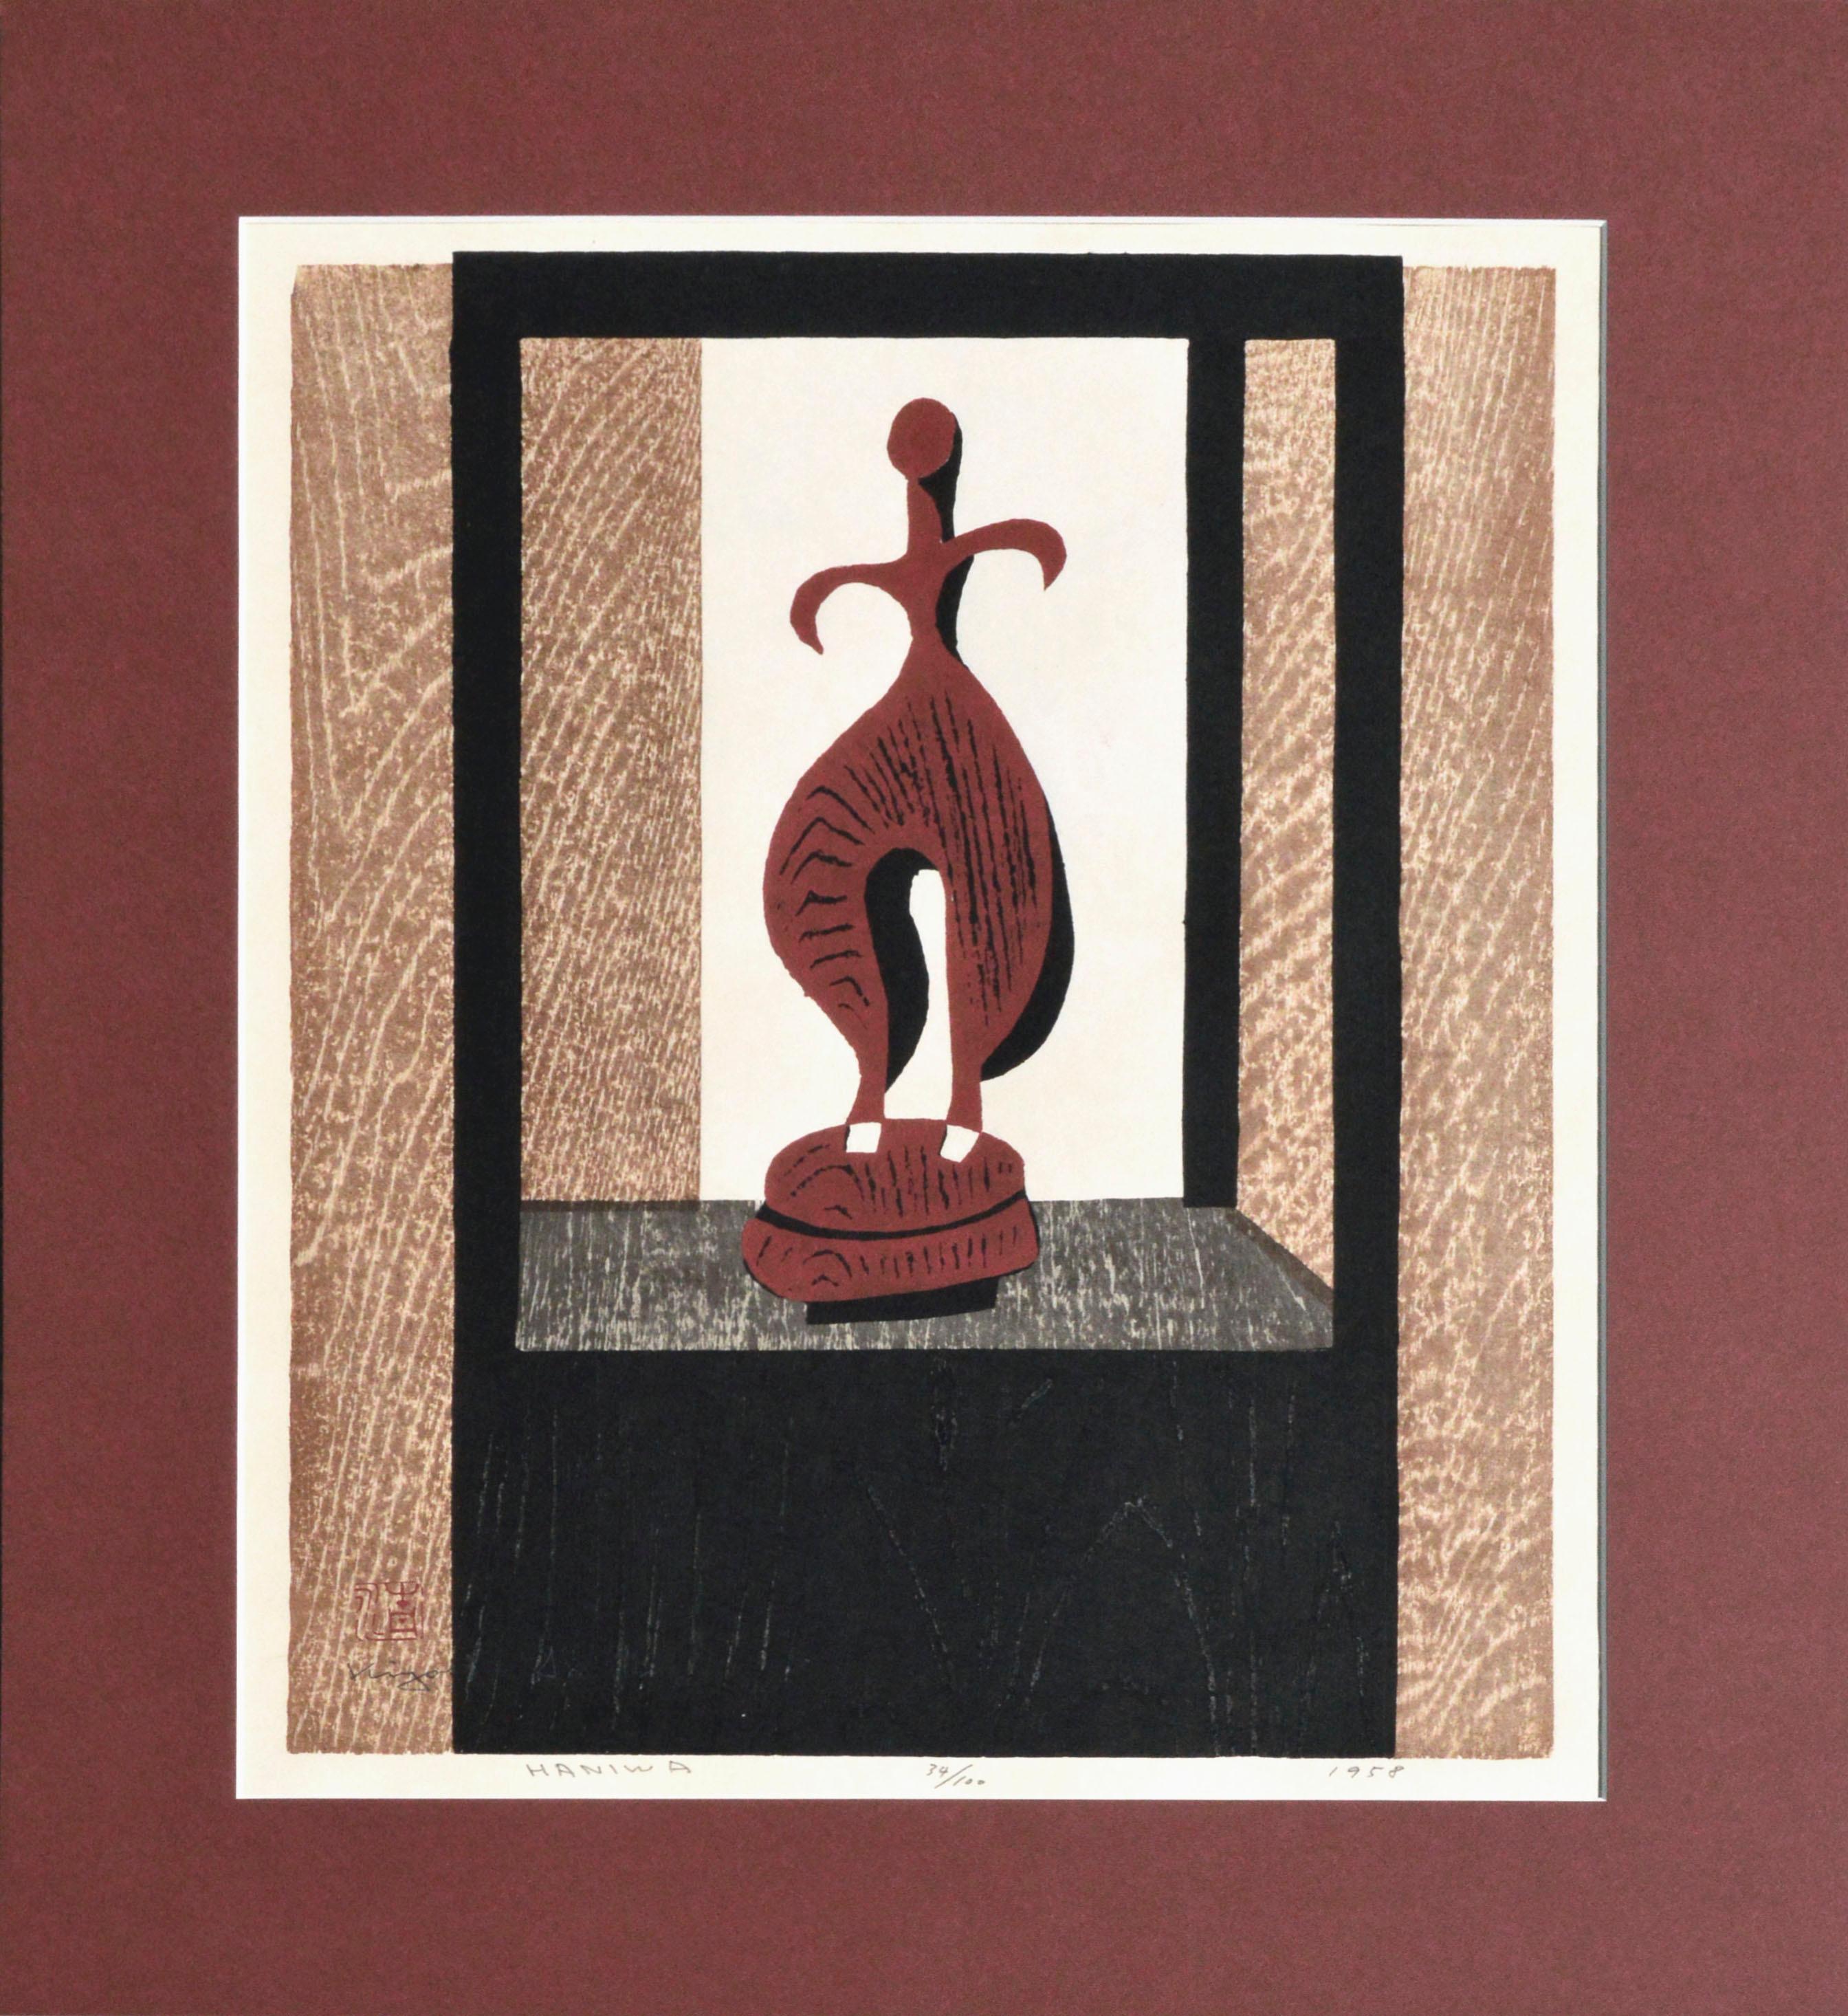 Terracotta, Haniwa Figure - Kofun Period Woodcut